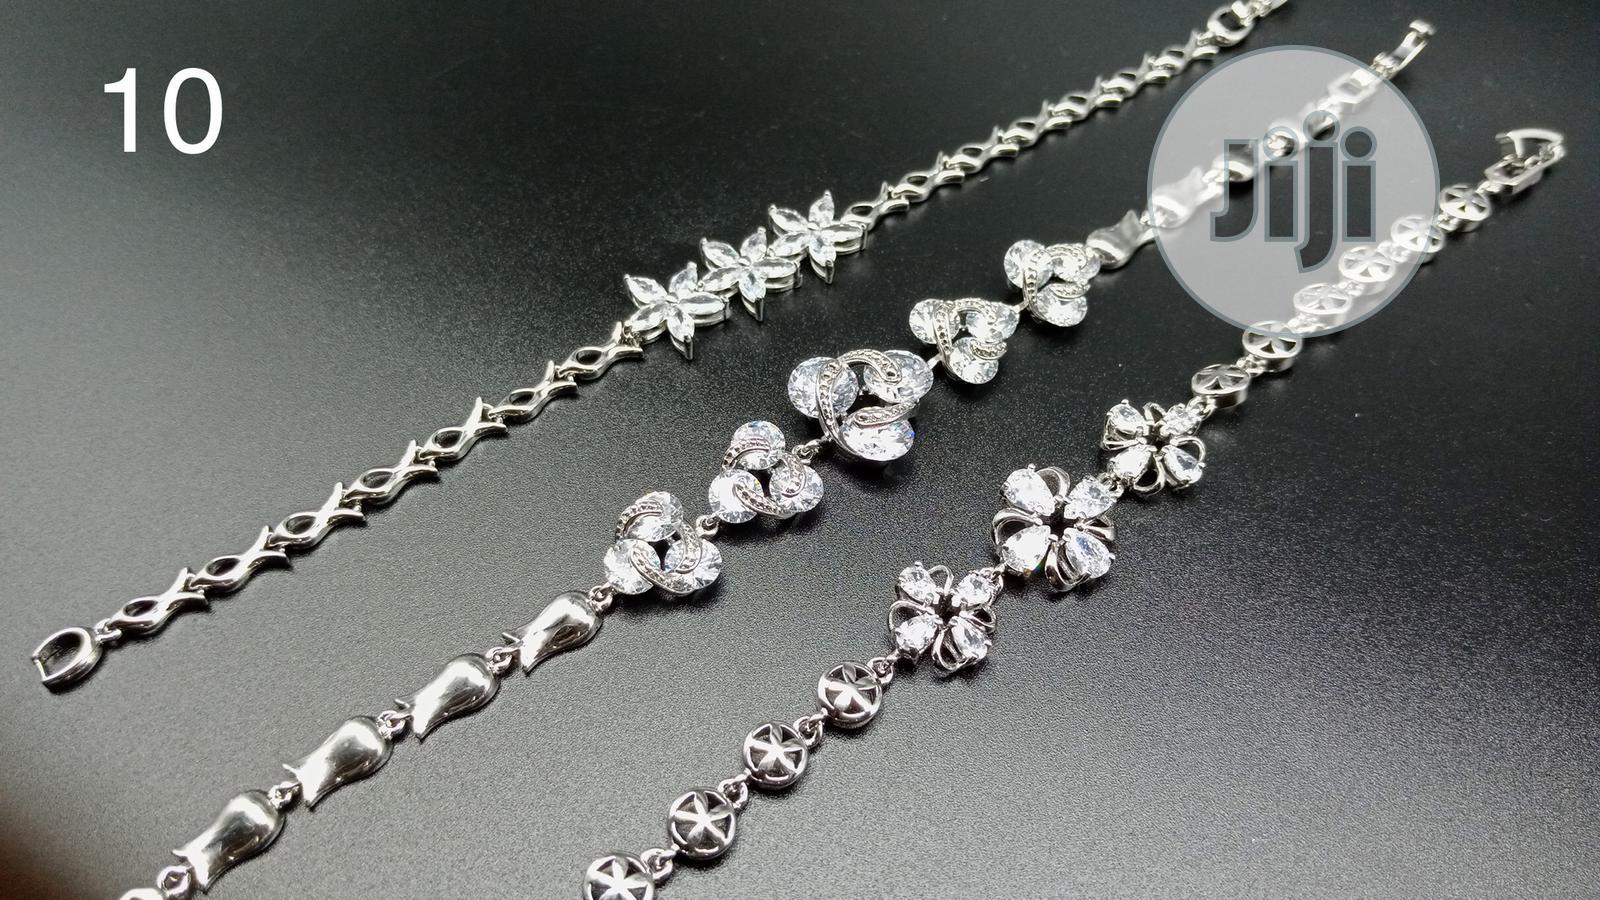 Bracelets With Ever Glitter Stones